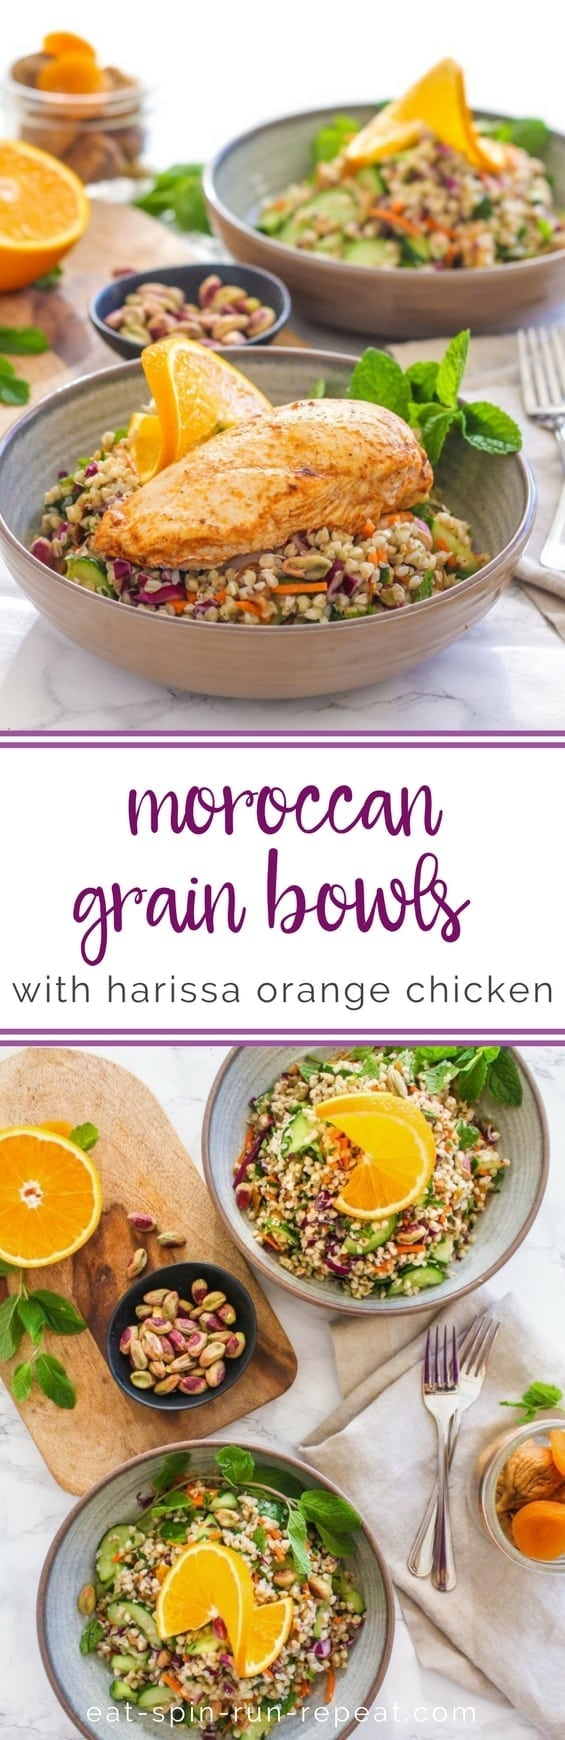 Moroccan Grain Bowls with Harissa Orange Chicken | #glutenfree #mealprep #harissa #moroccan #dairyfree #buckwheat | Recipe by Angela Simpson, Eat Spin Run Repeat